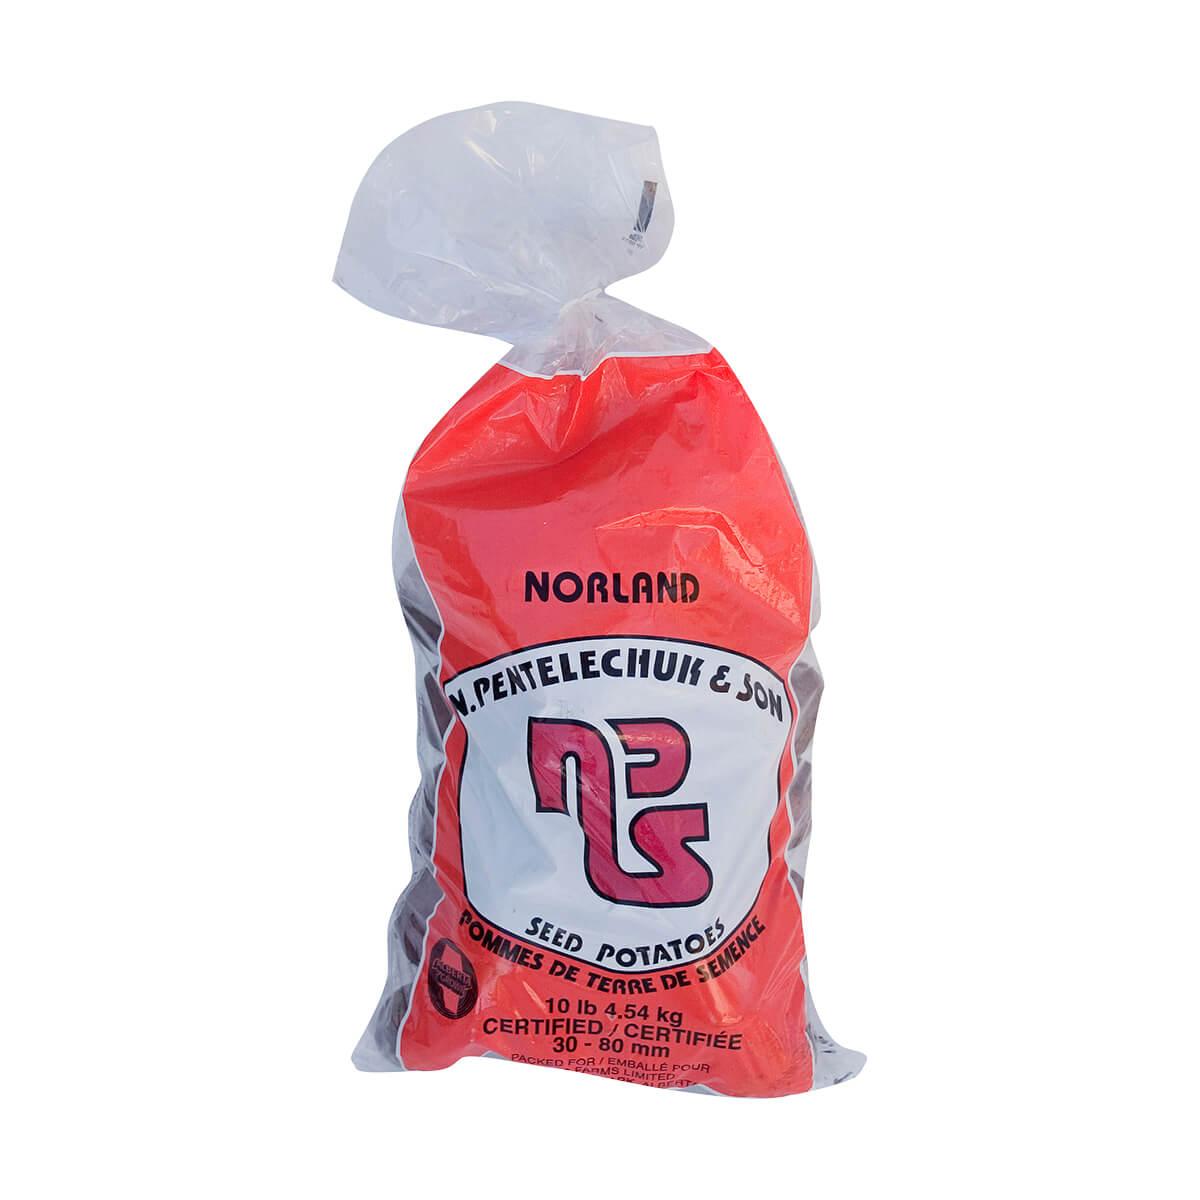 Norland Seed Potatoes - 5lb